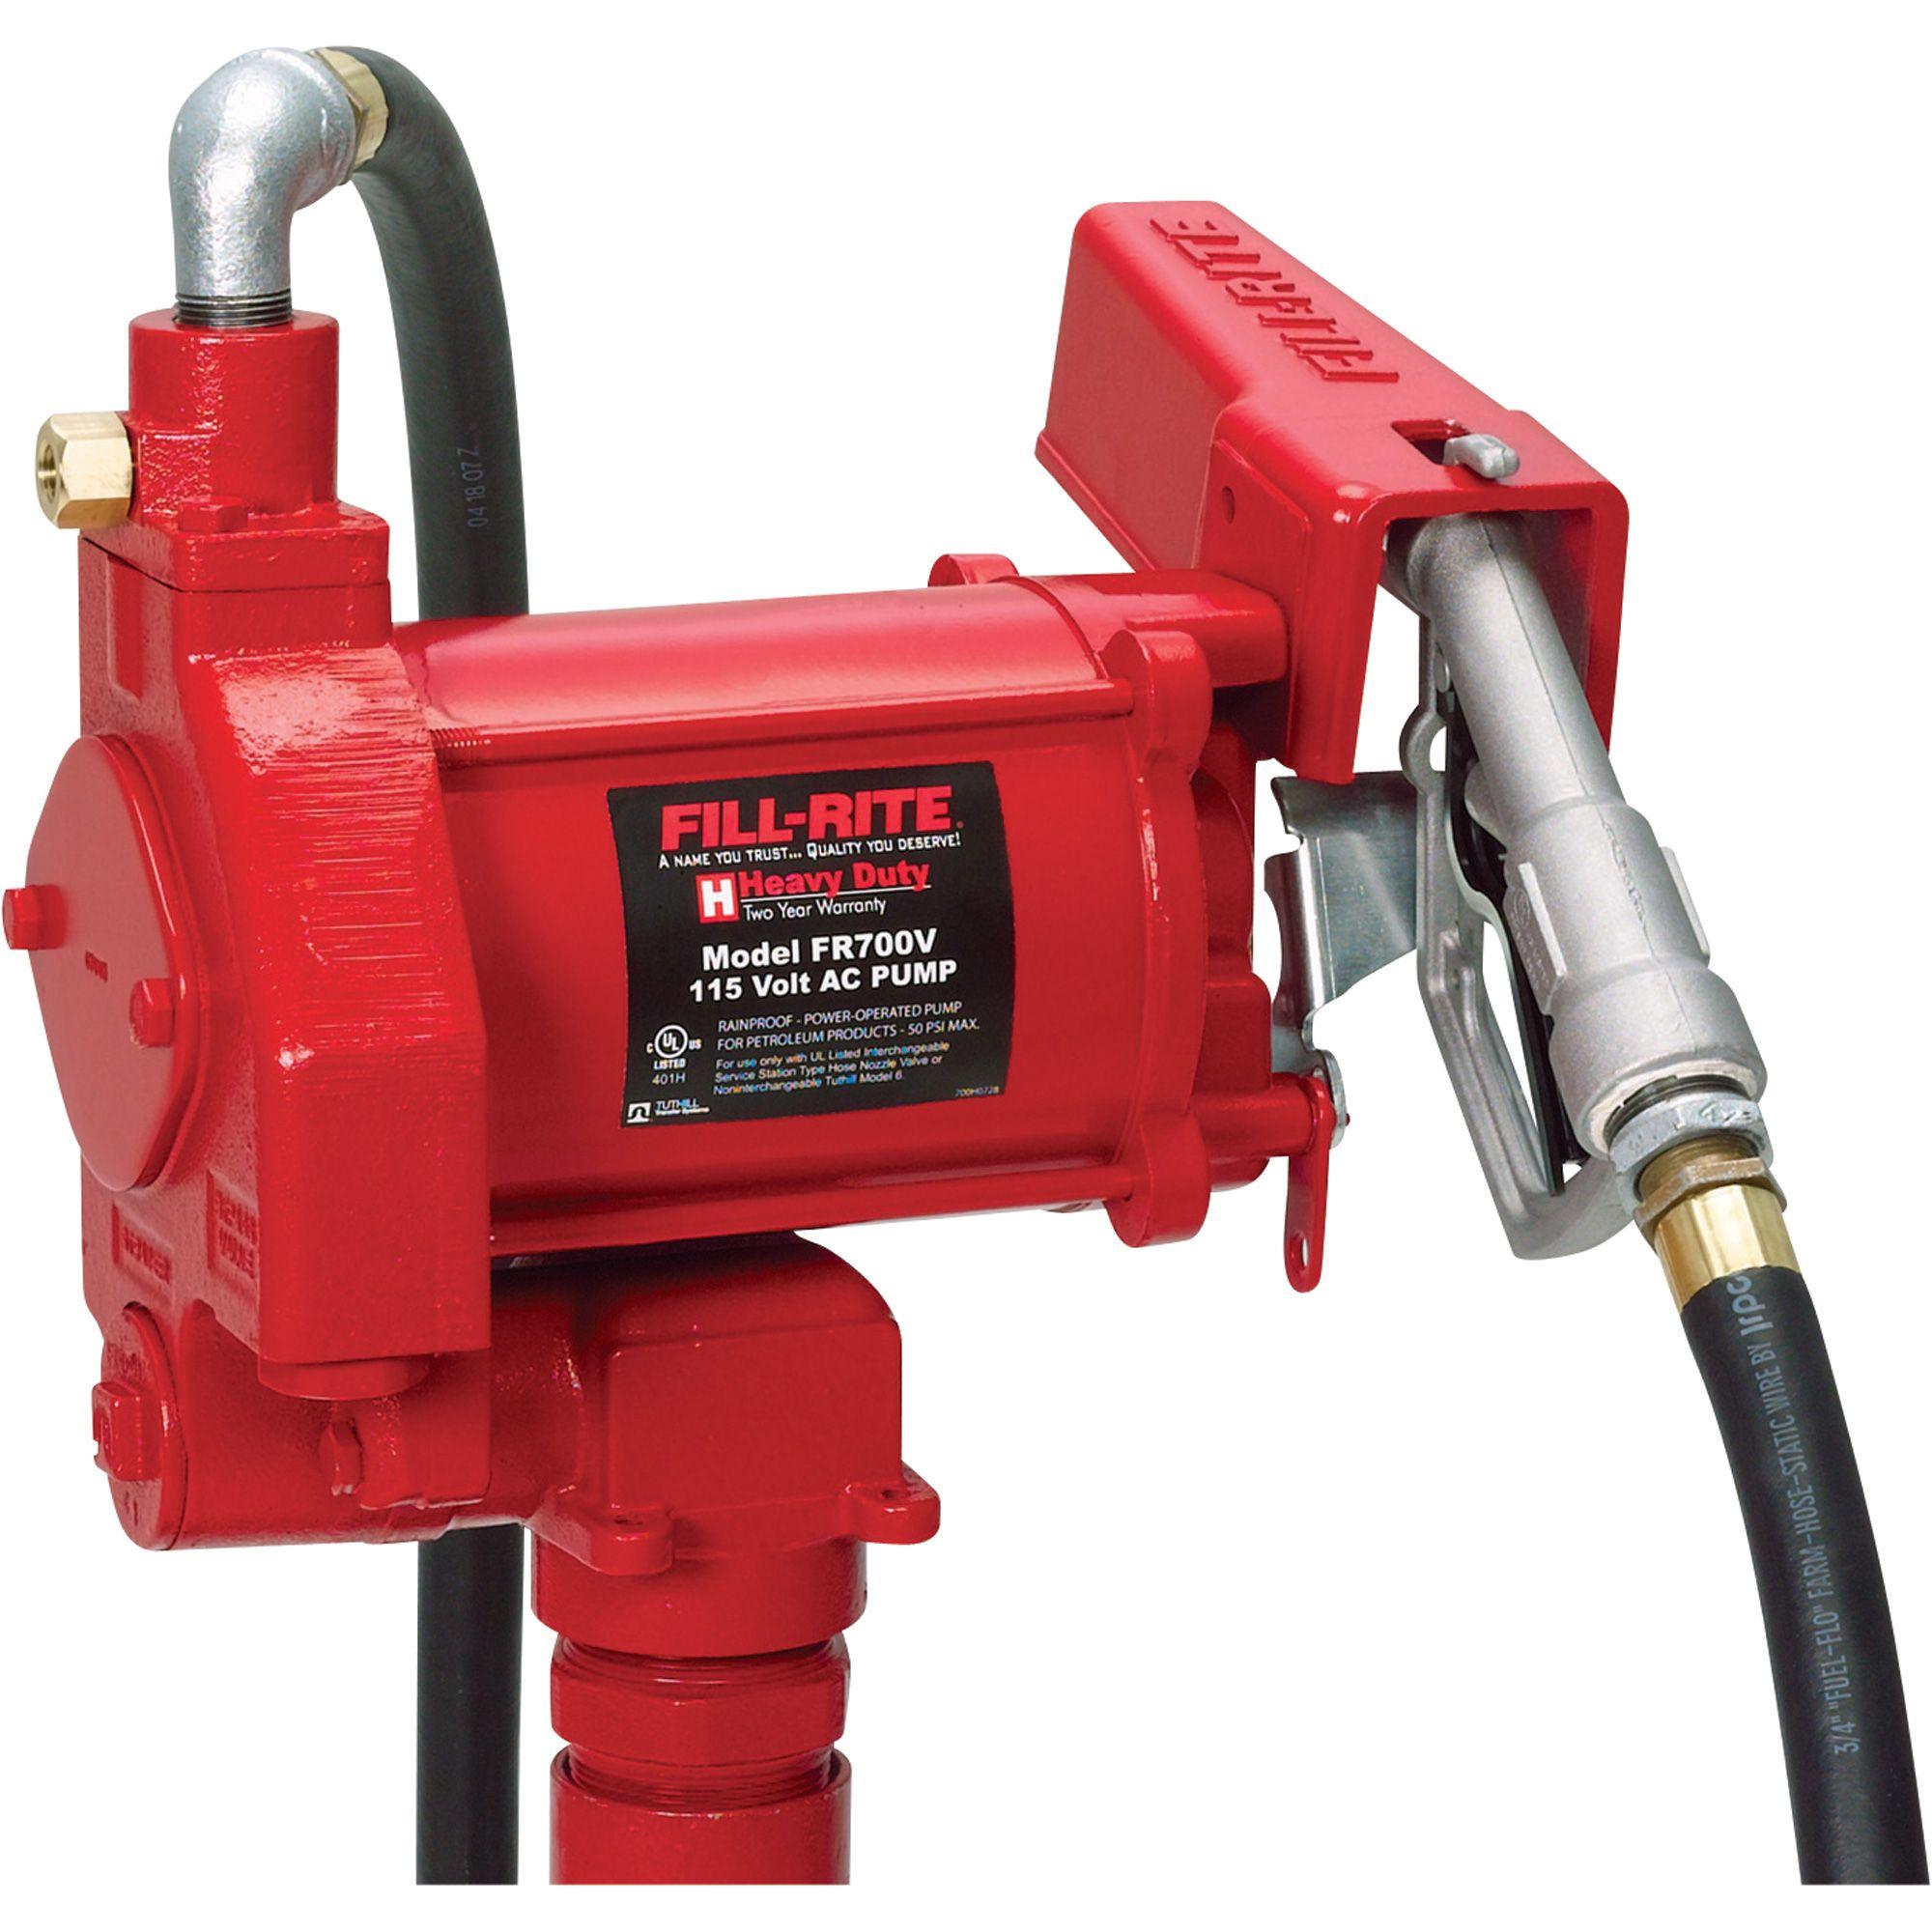 Fill-Rite Fuel Transfer Pump | Fuel Transfer + Lubrication